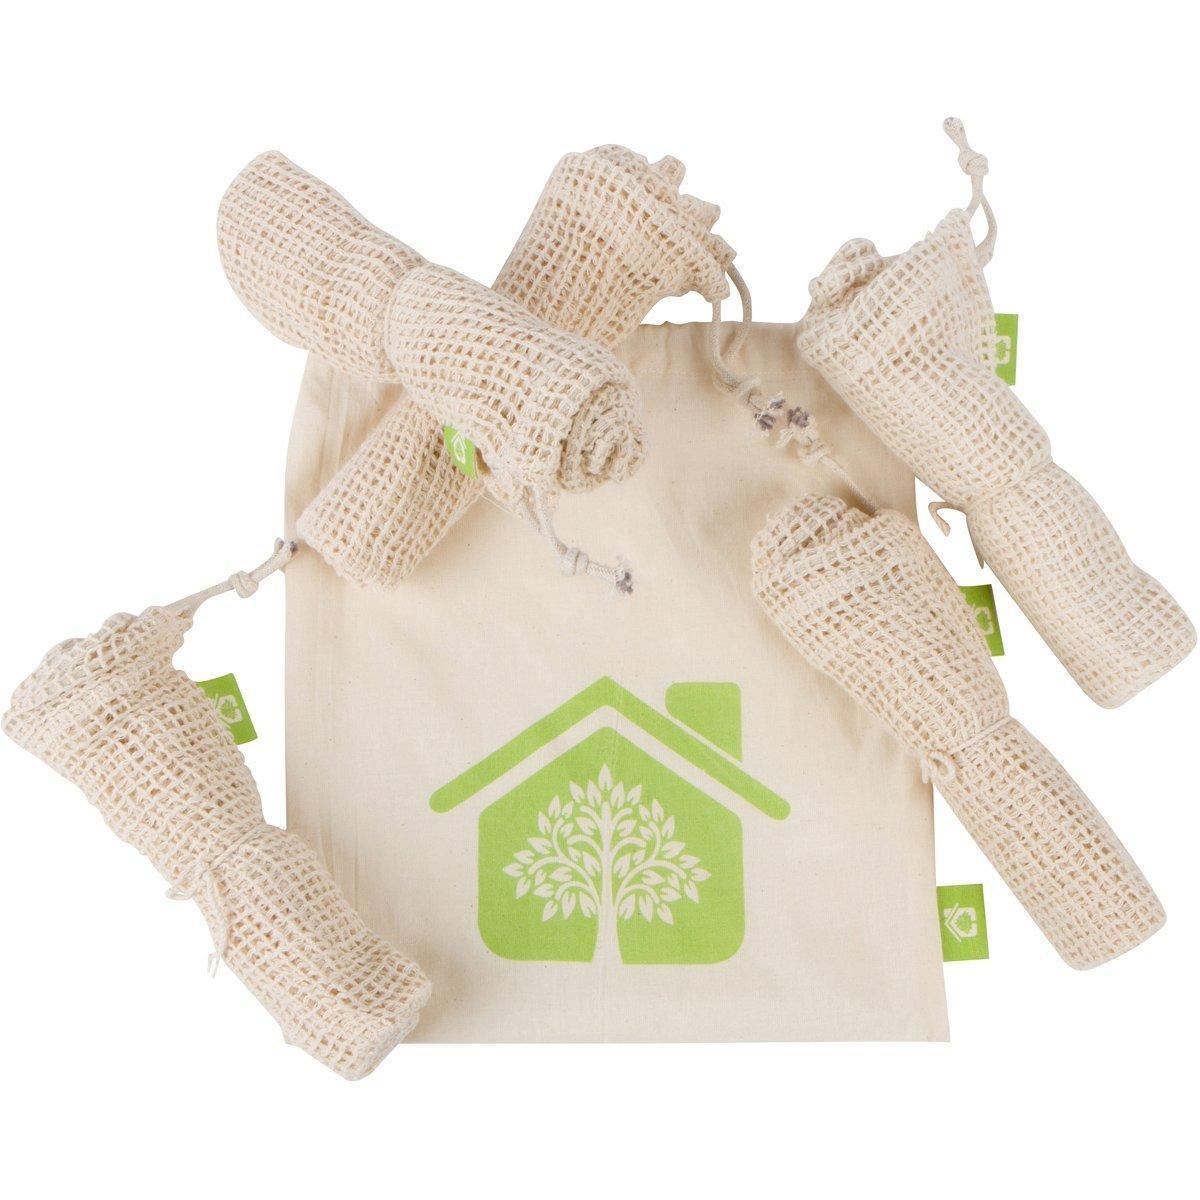 Reusable Produce Bags – Organic Cotton Mesh bags 5